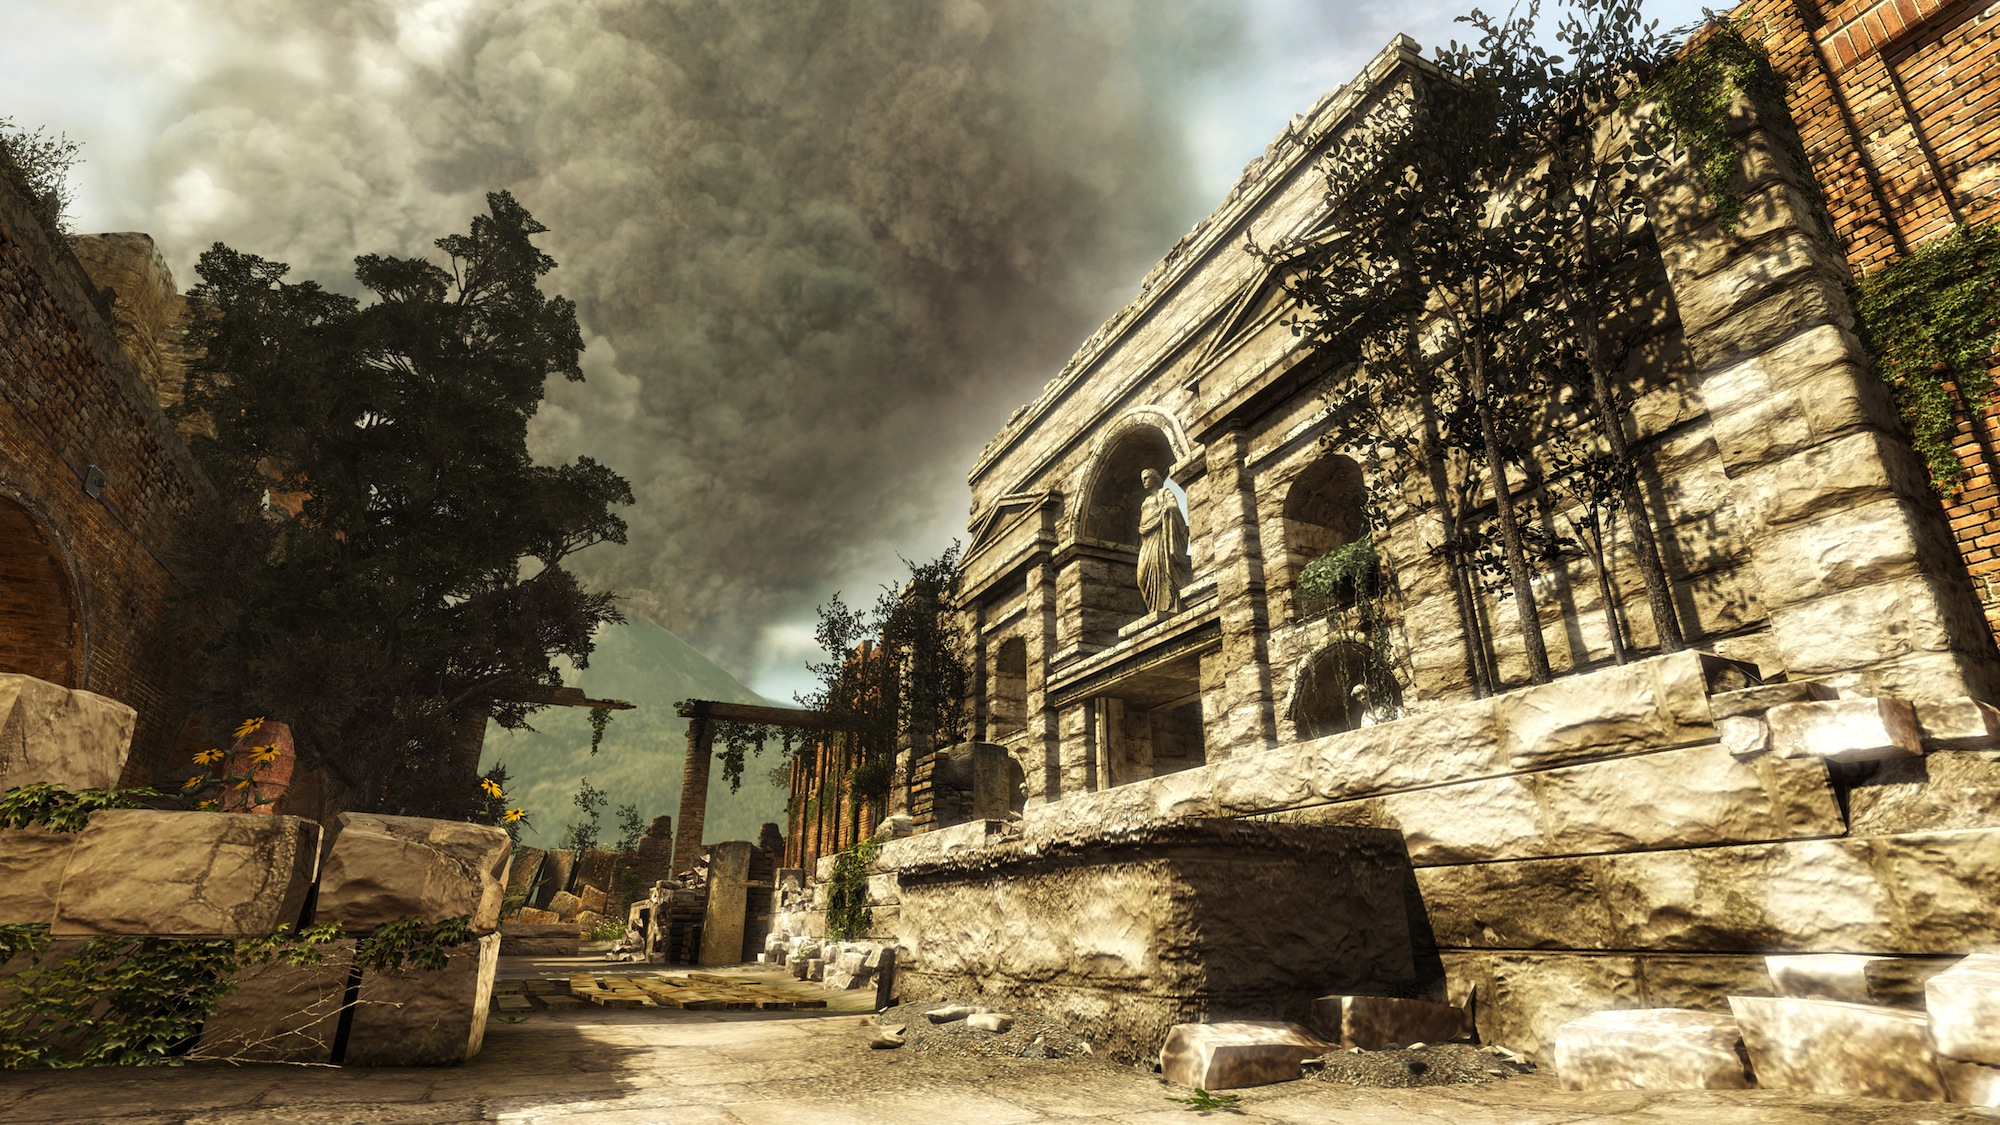 Erosion Call Of Duty Wiki Fandom Powered By Wikia